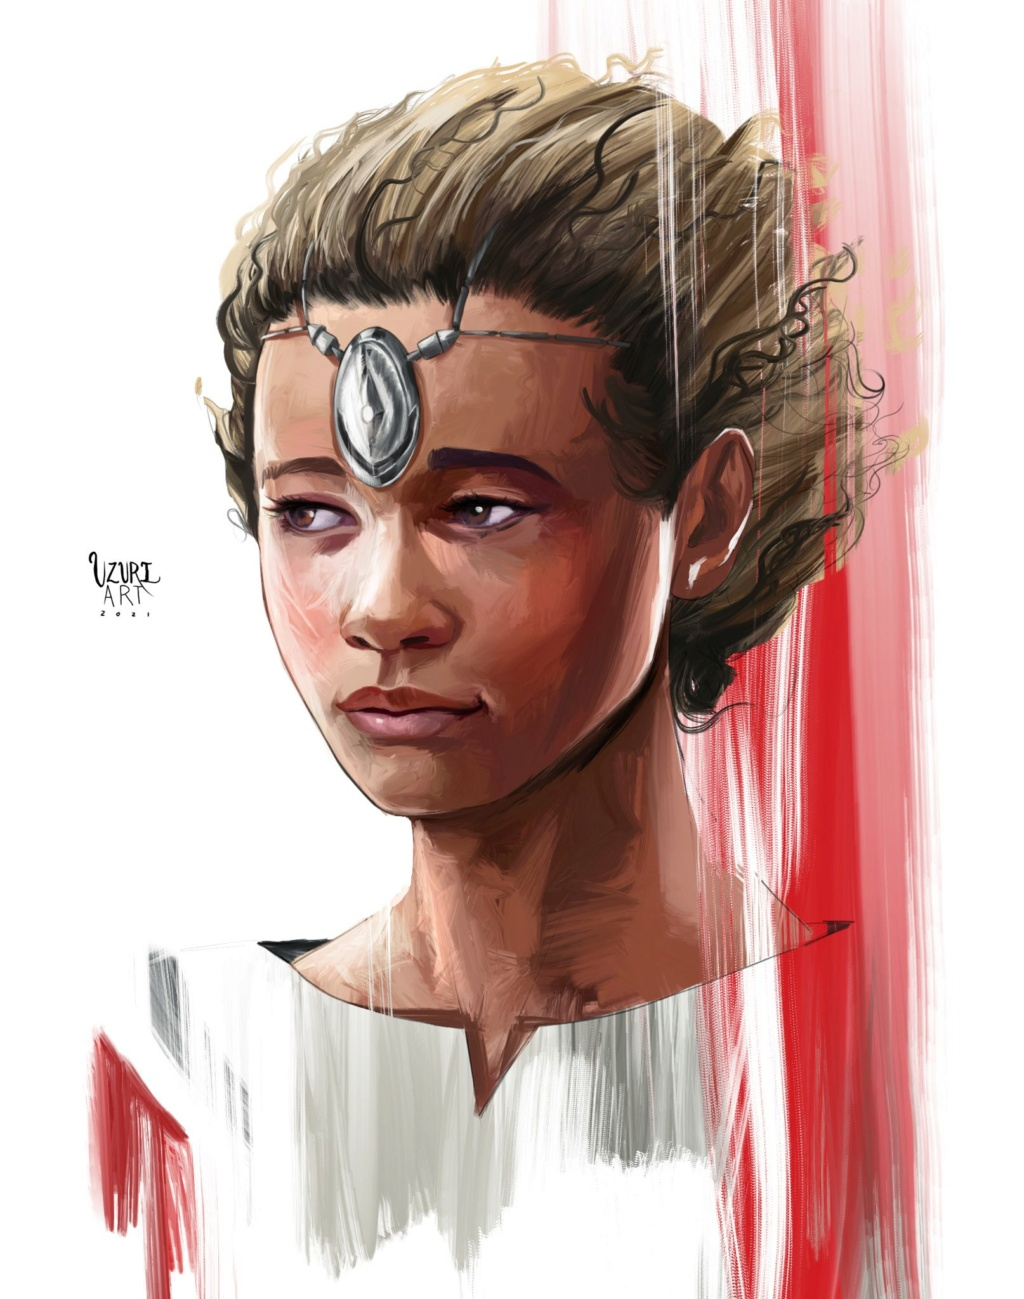 Digital Art par UZURI ART - Star Wars Uzuri_42